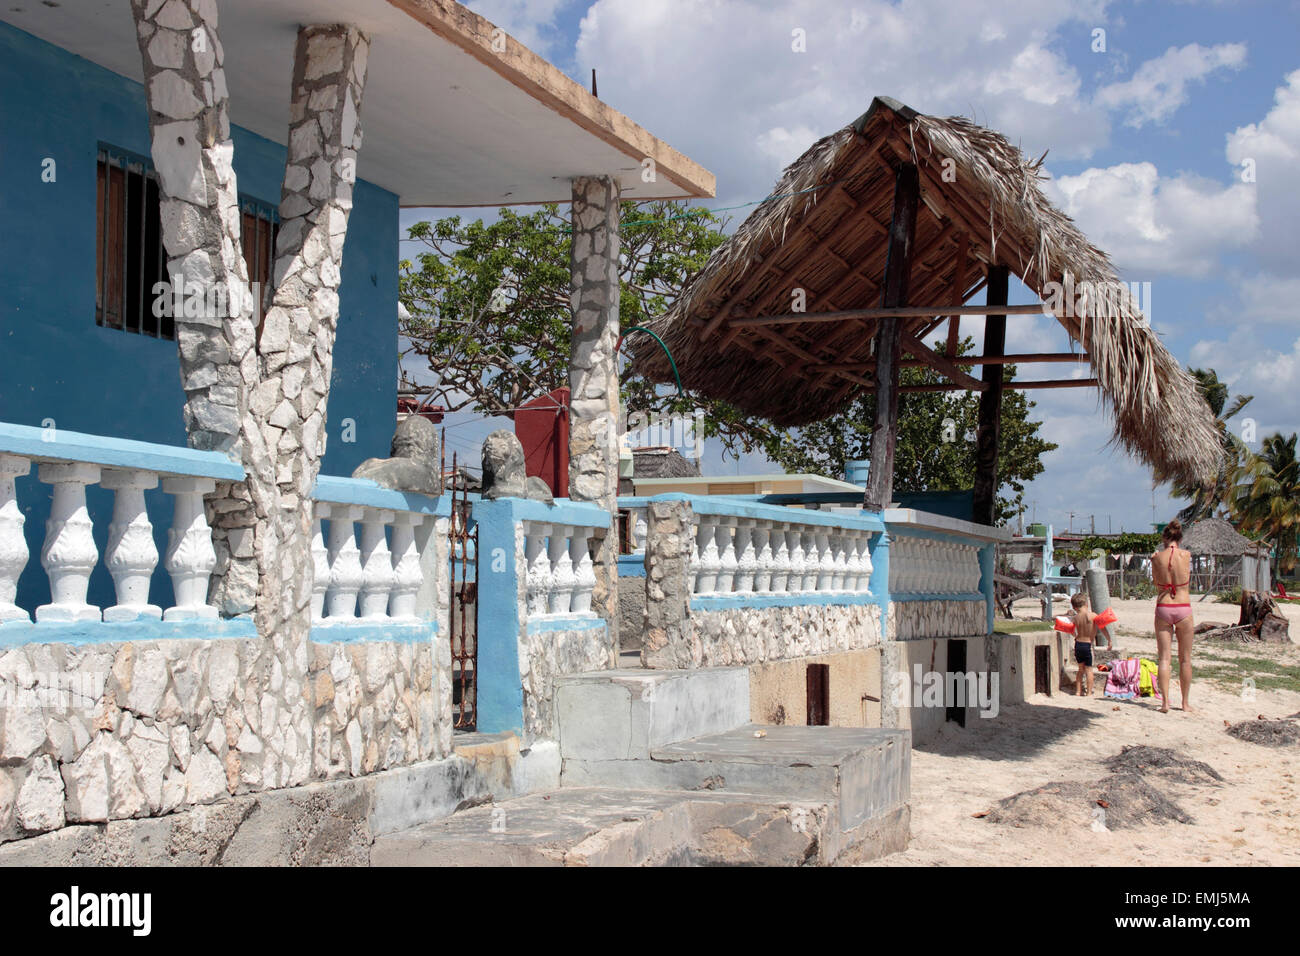 Beach house on the beach at Zapata Peninsula Cuba - Stock Image